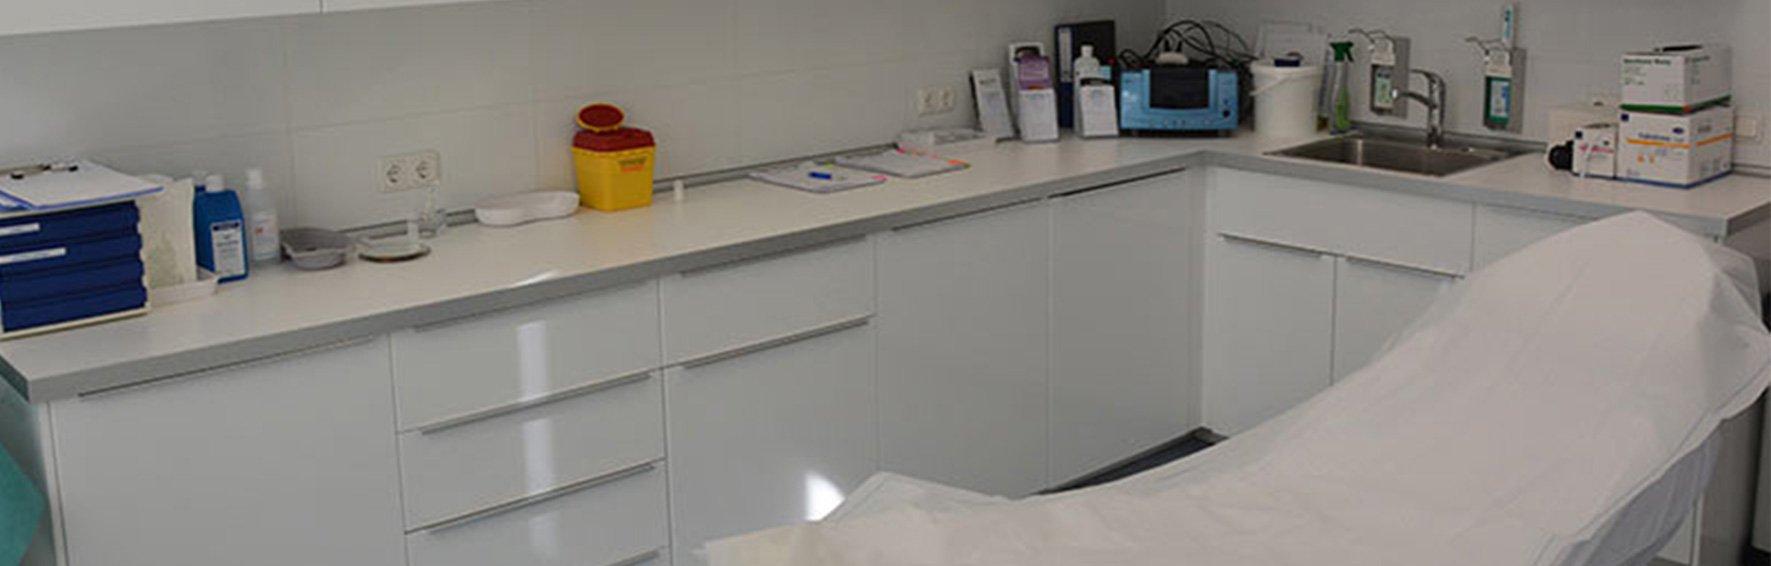 Alster-Klinik Hamburg Behandlungszimmer